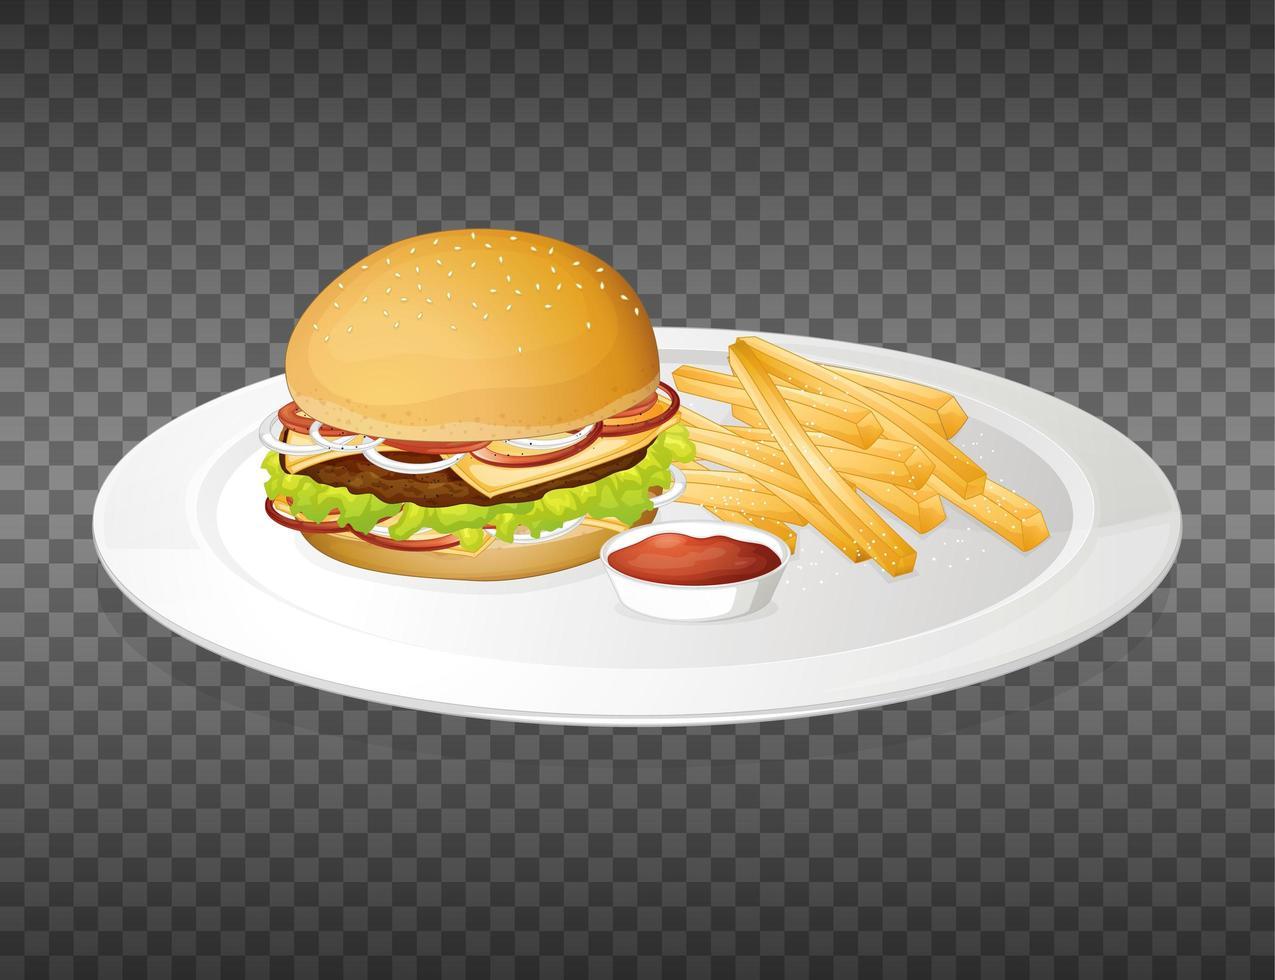 Hamburger auf Teller isoliert vektor